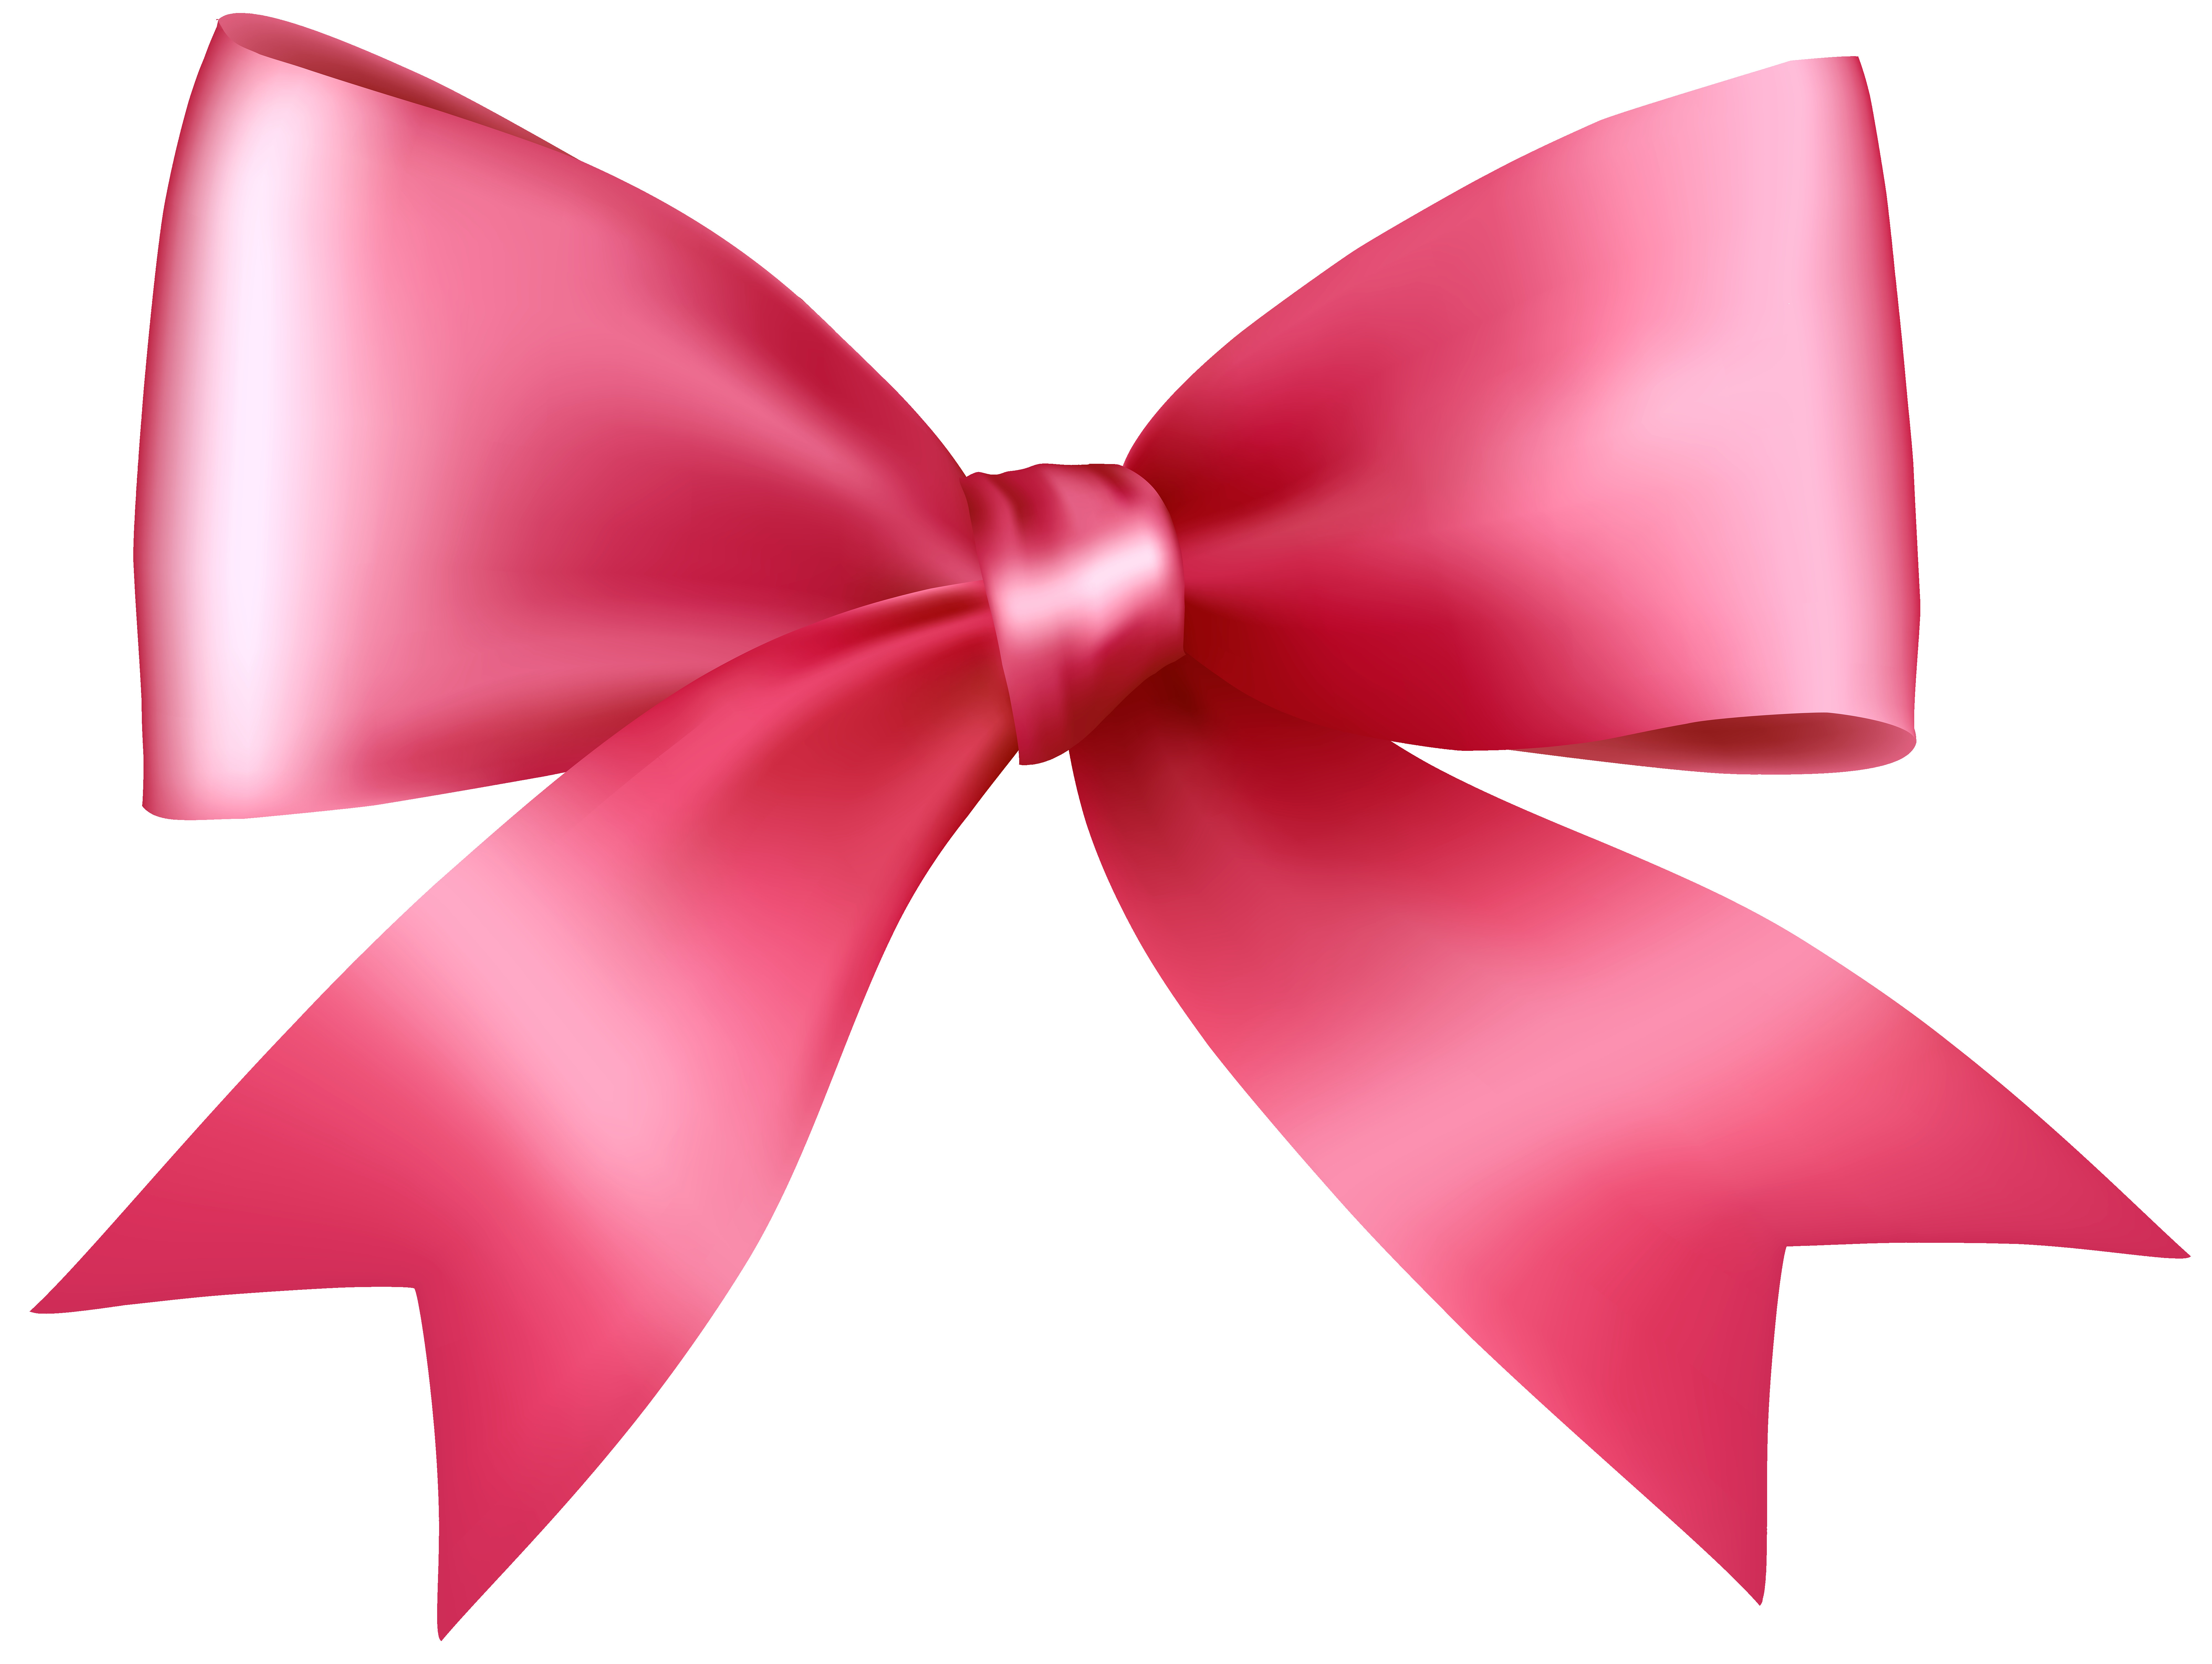 8000x6017 Pink Bow Transparent Png Clip Art Image Png M 1470970502